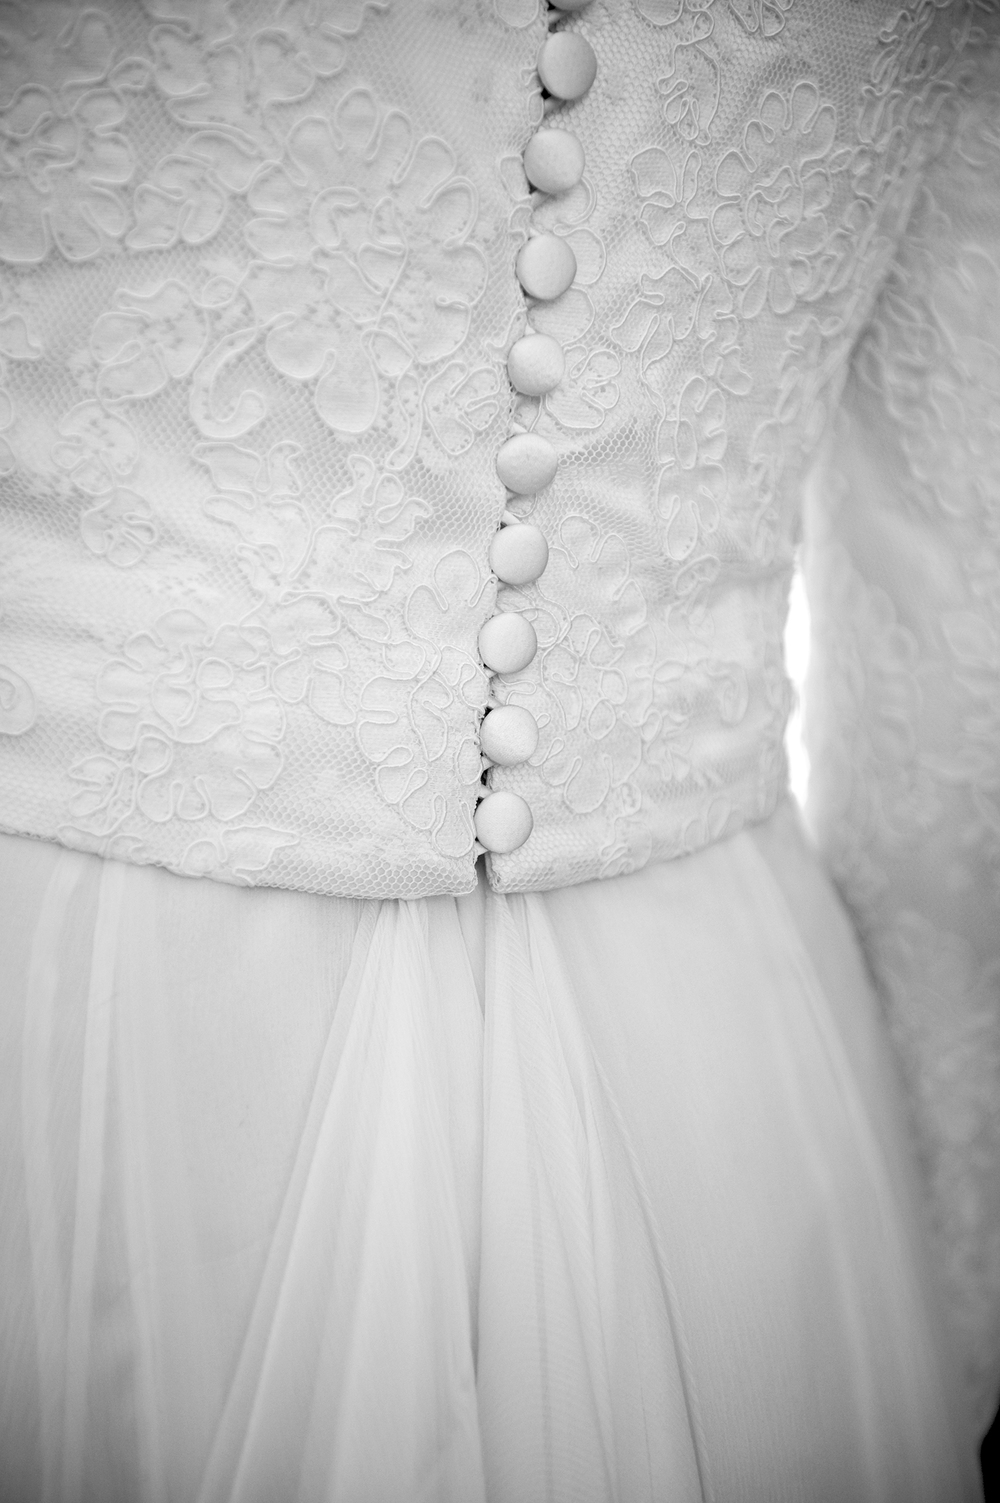 Bettina-Conradi_Hochzeit28.jpg